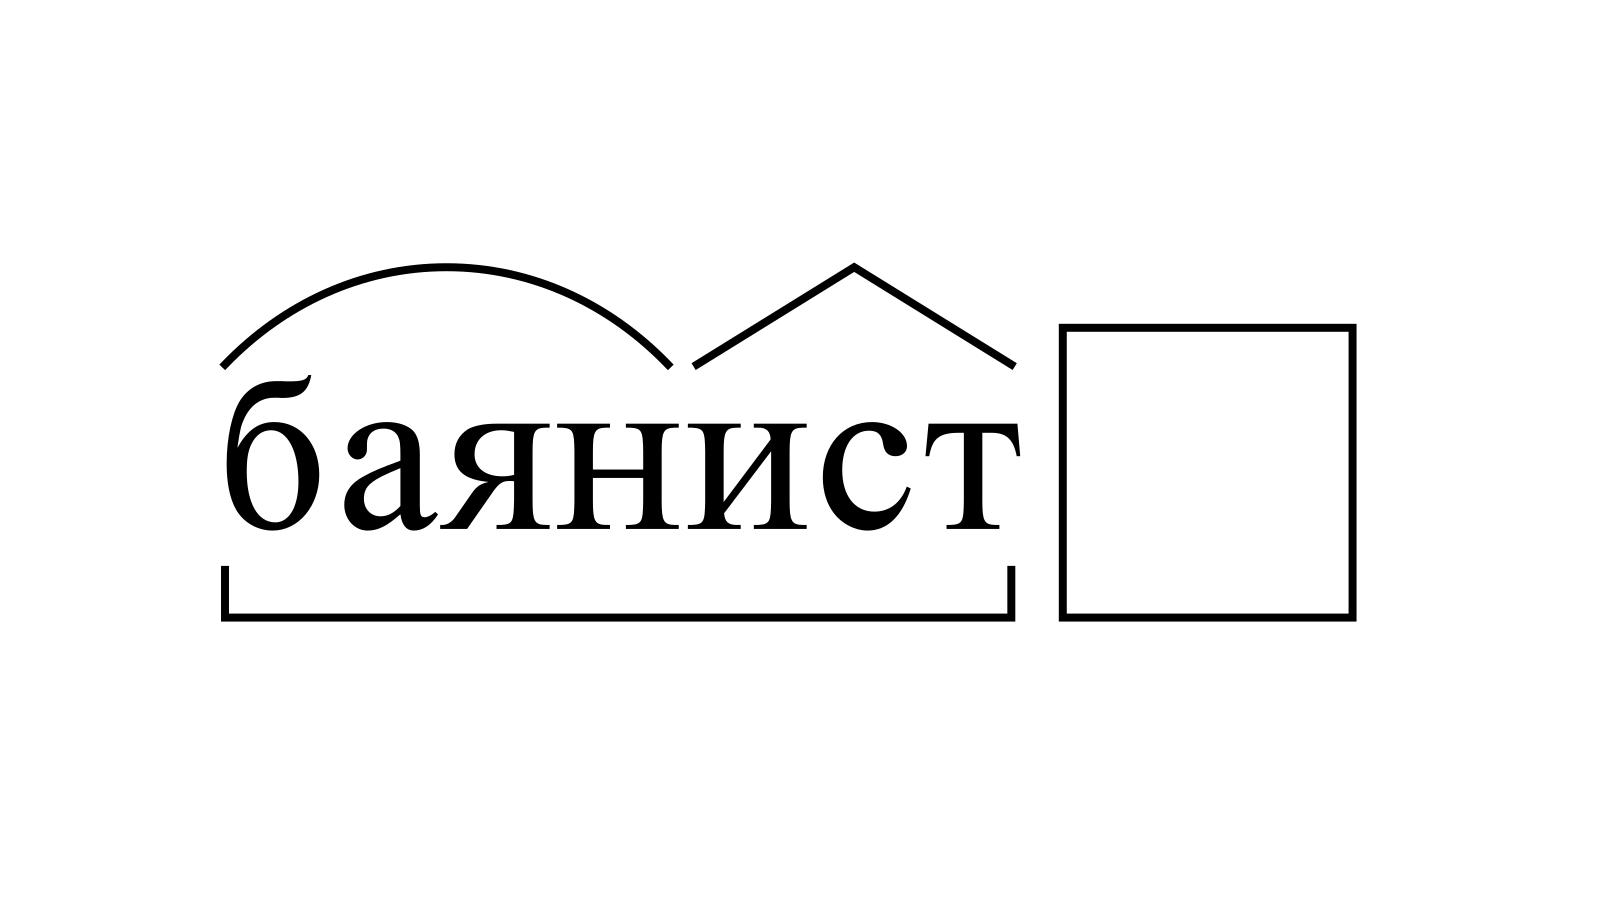 Разбор слова «баянист» по составу